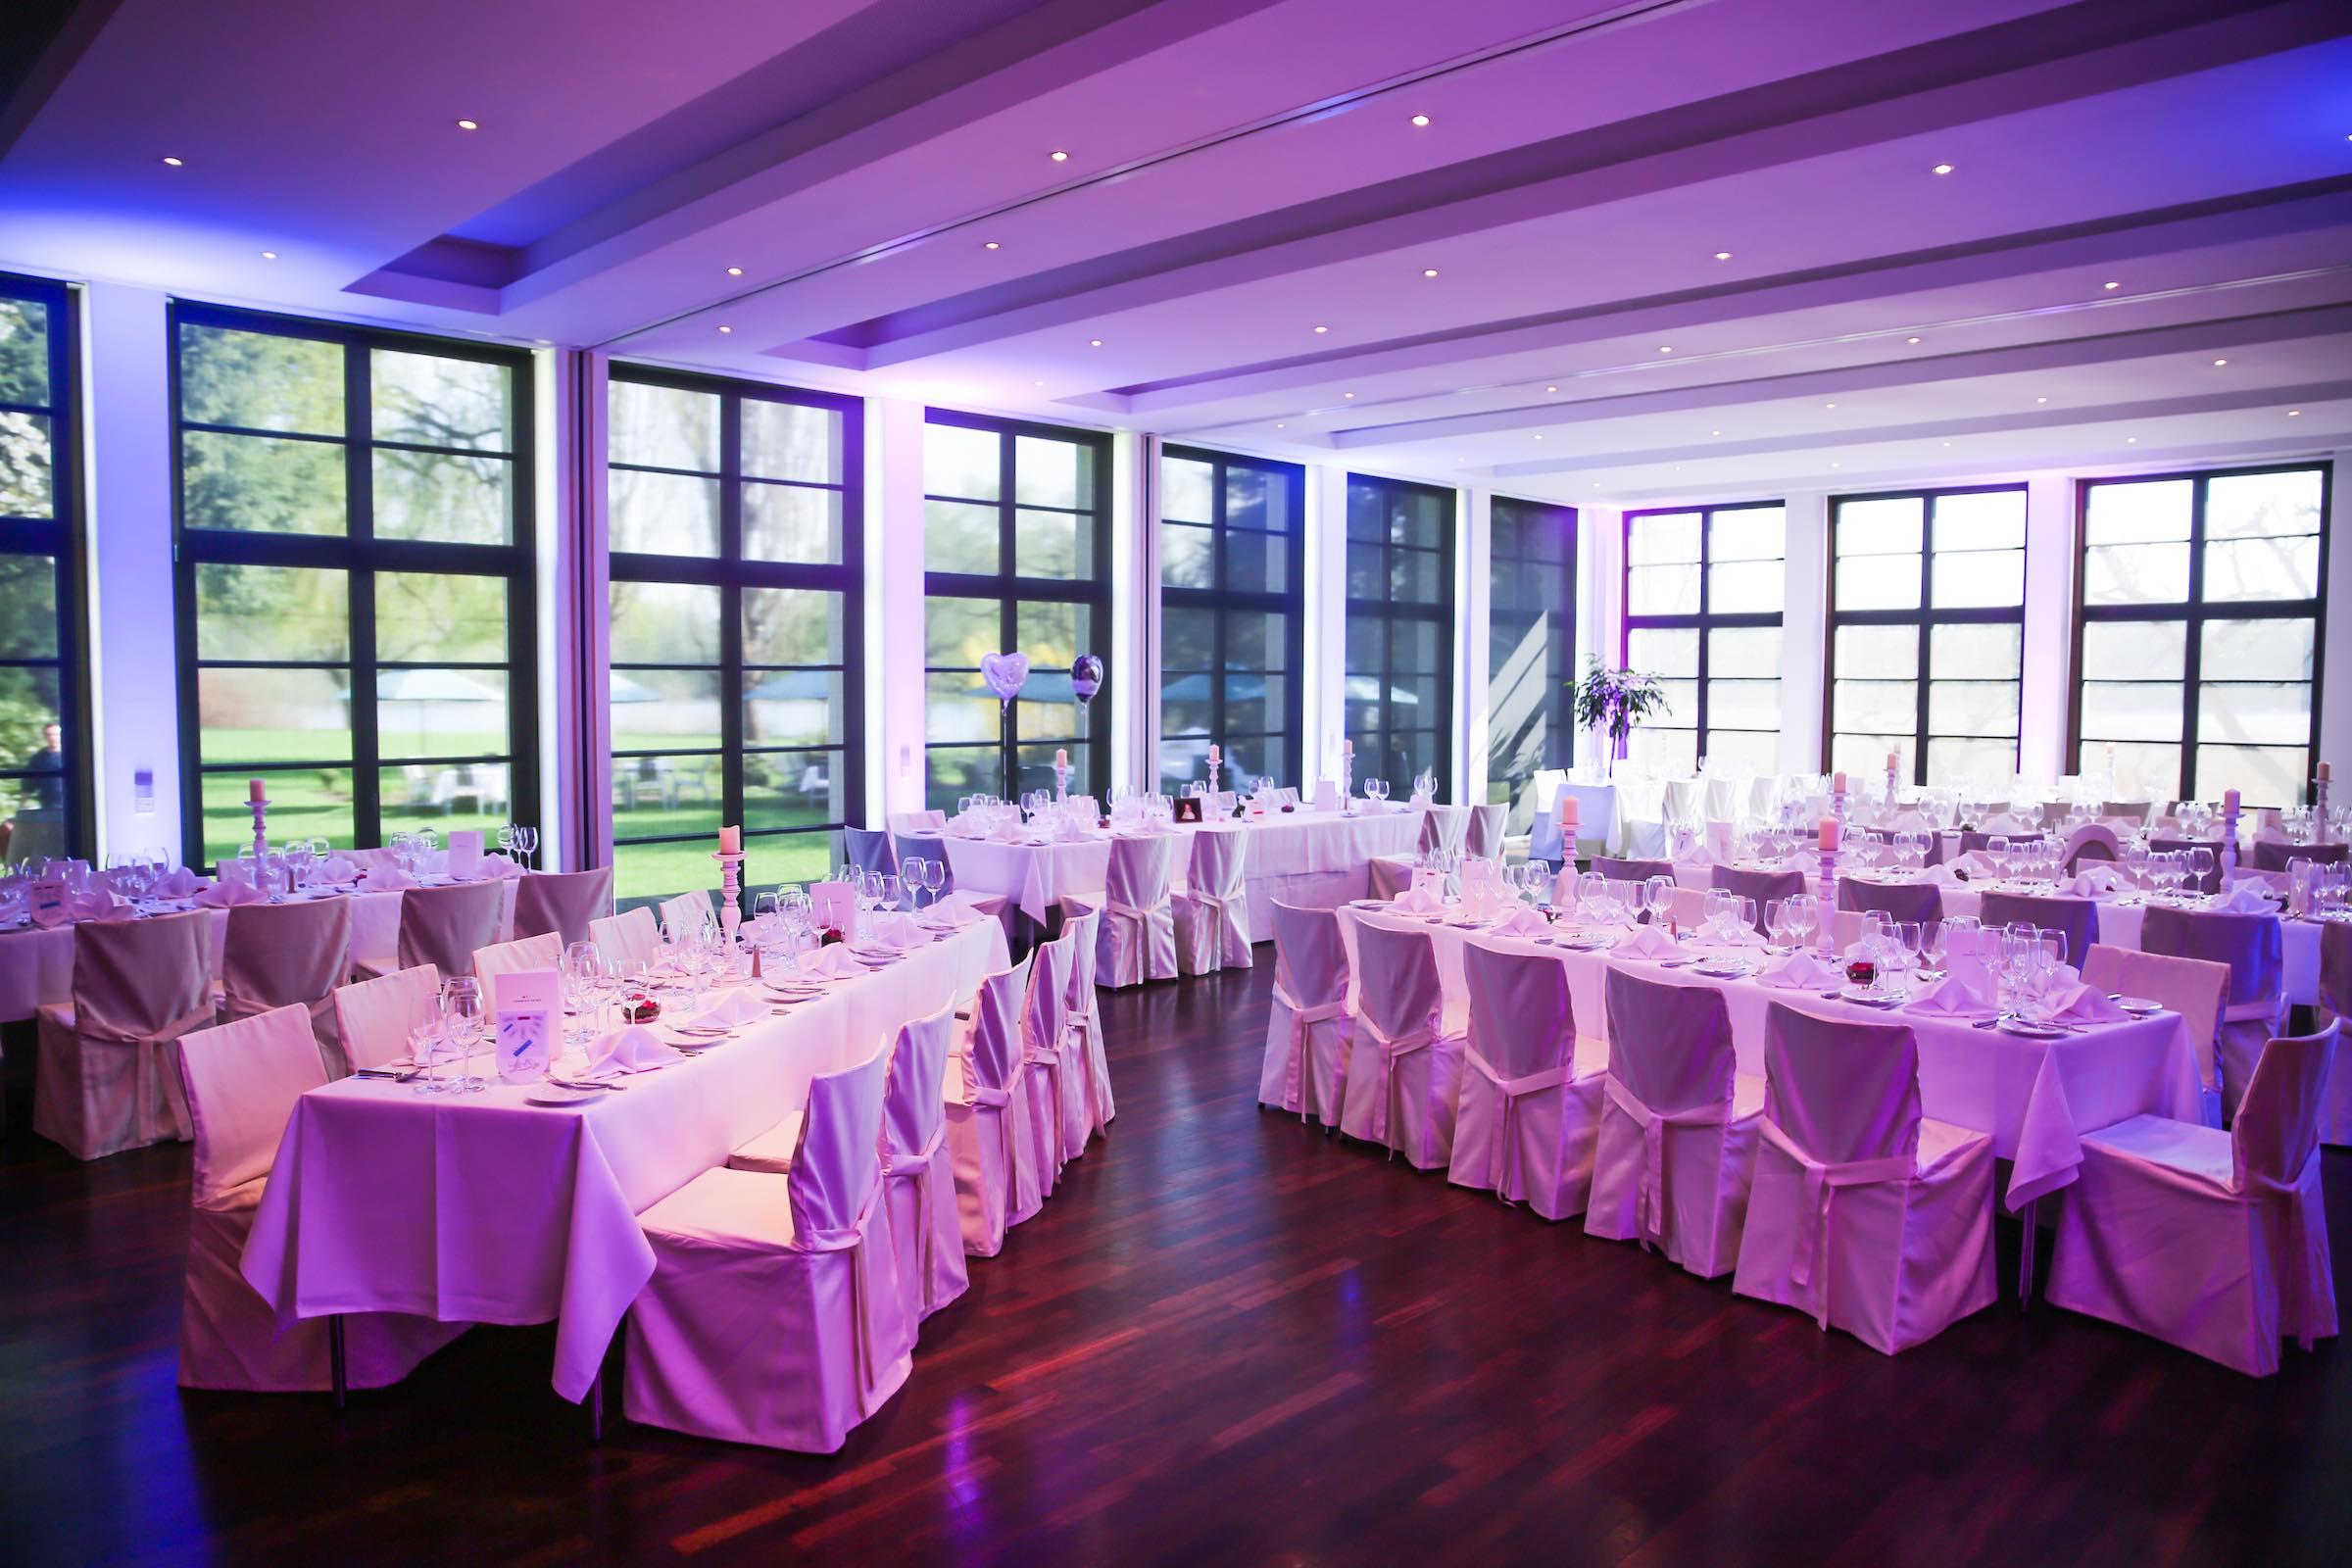 Beleuchtung | Hochzeits | Location | Messe | Firmenveranstaltung | Gala | Event | Indoor | Outdoor | LED | Spots | Raumbeleuchtung | Lichttechnik | Ambientebeleuchtung | Uplight | Buchen | Mieten | Anfragen